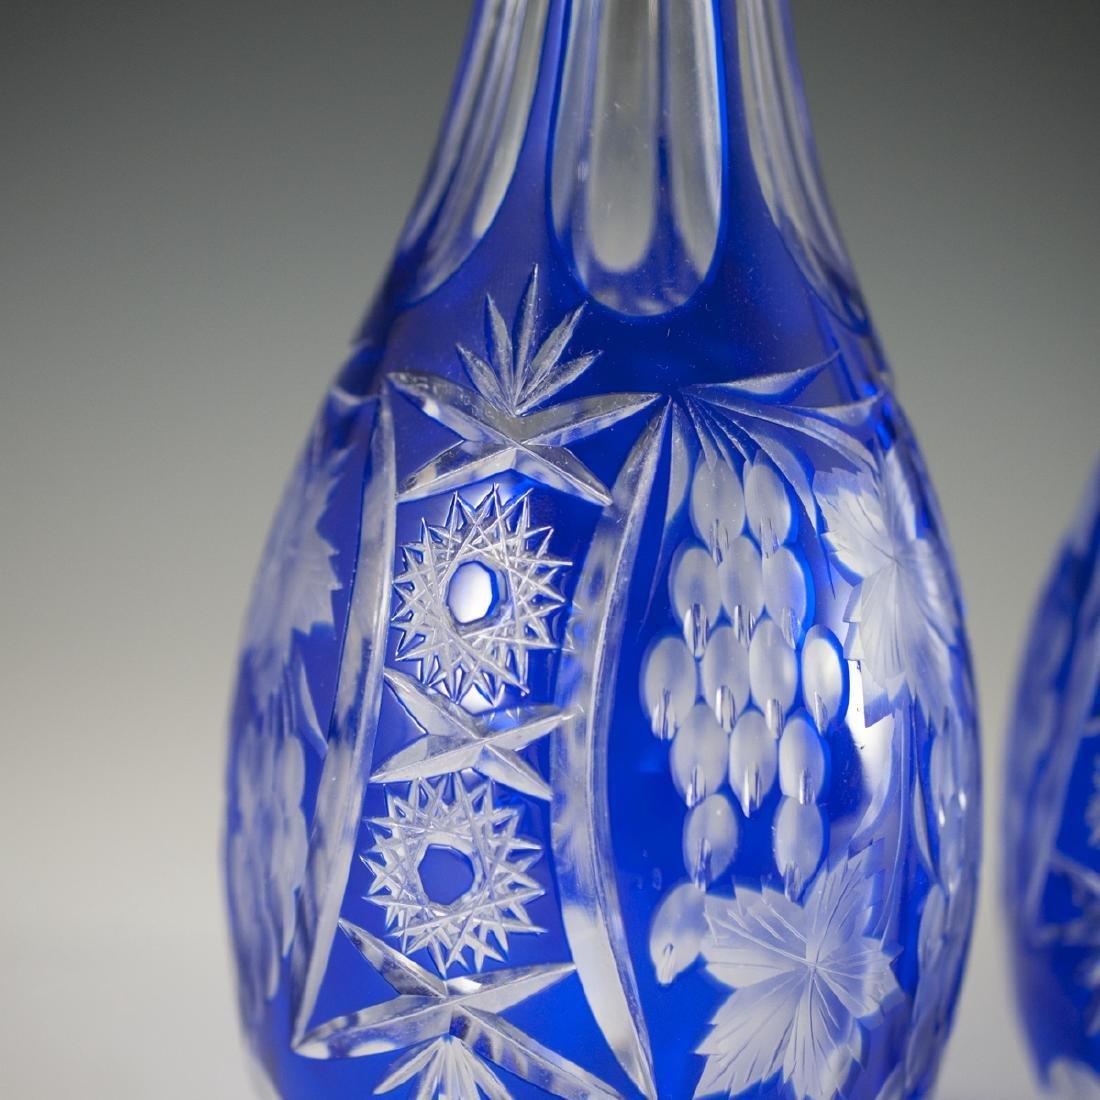 Bohemian Cobalt Crystal Decanters - 4